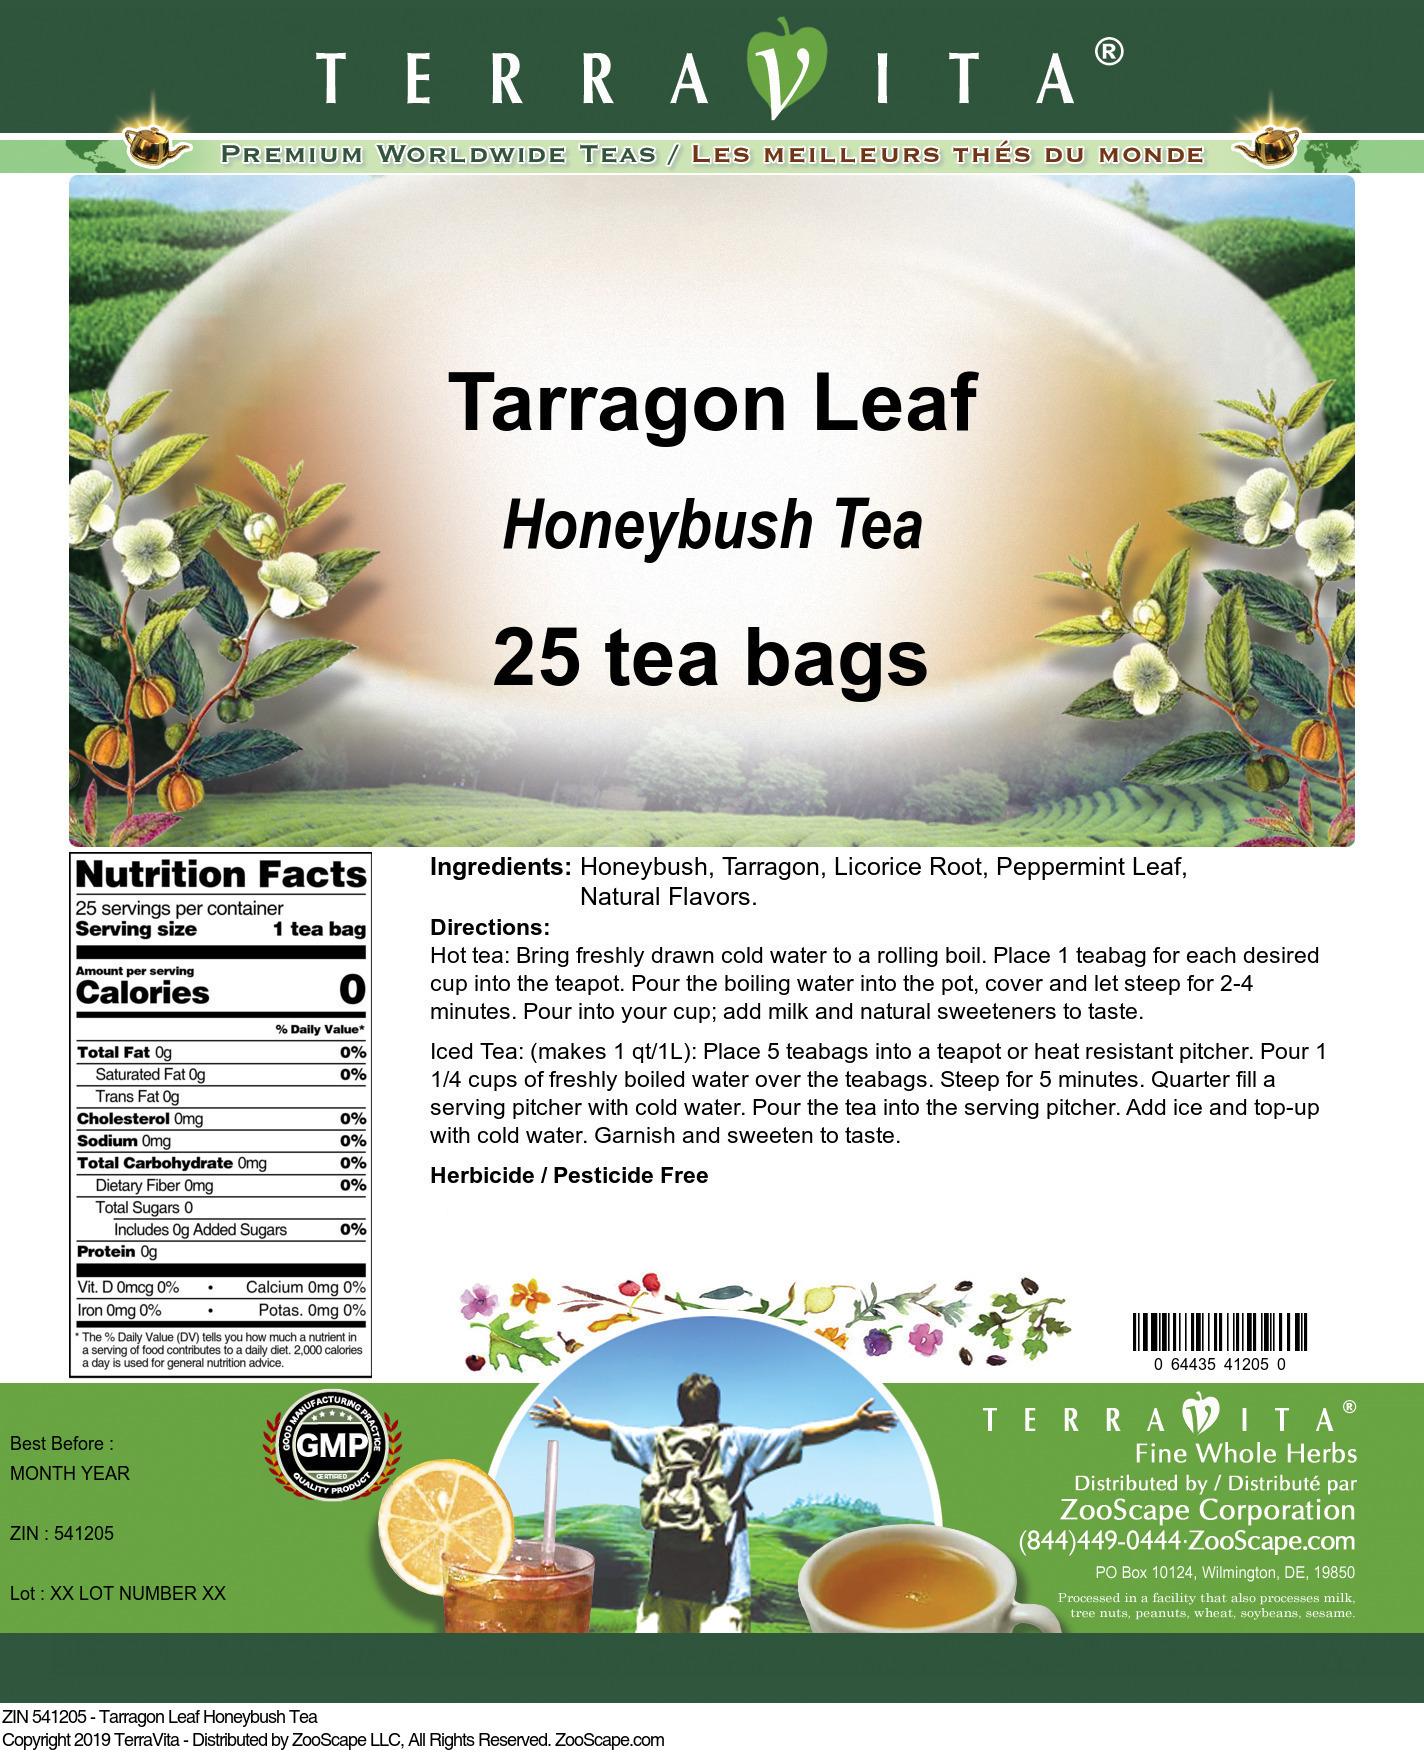 Tarragon Leaf Honeybush Tea